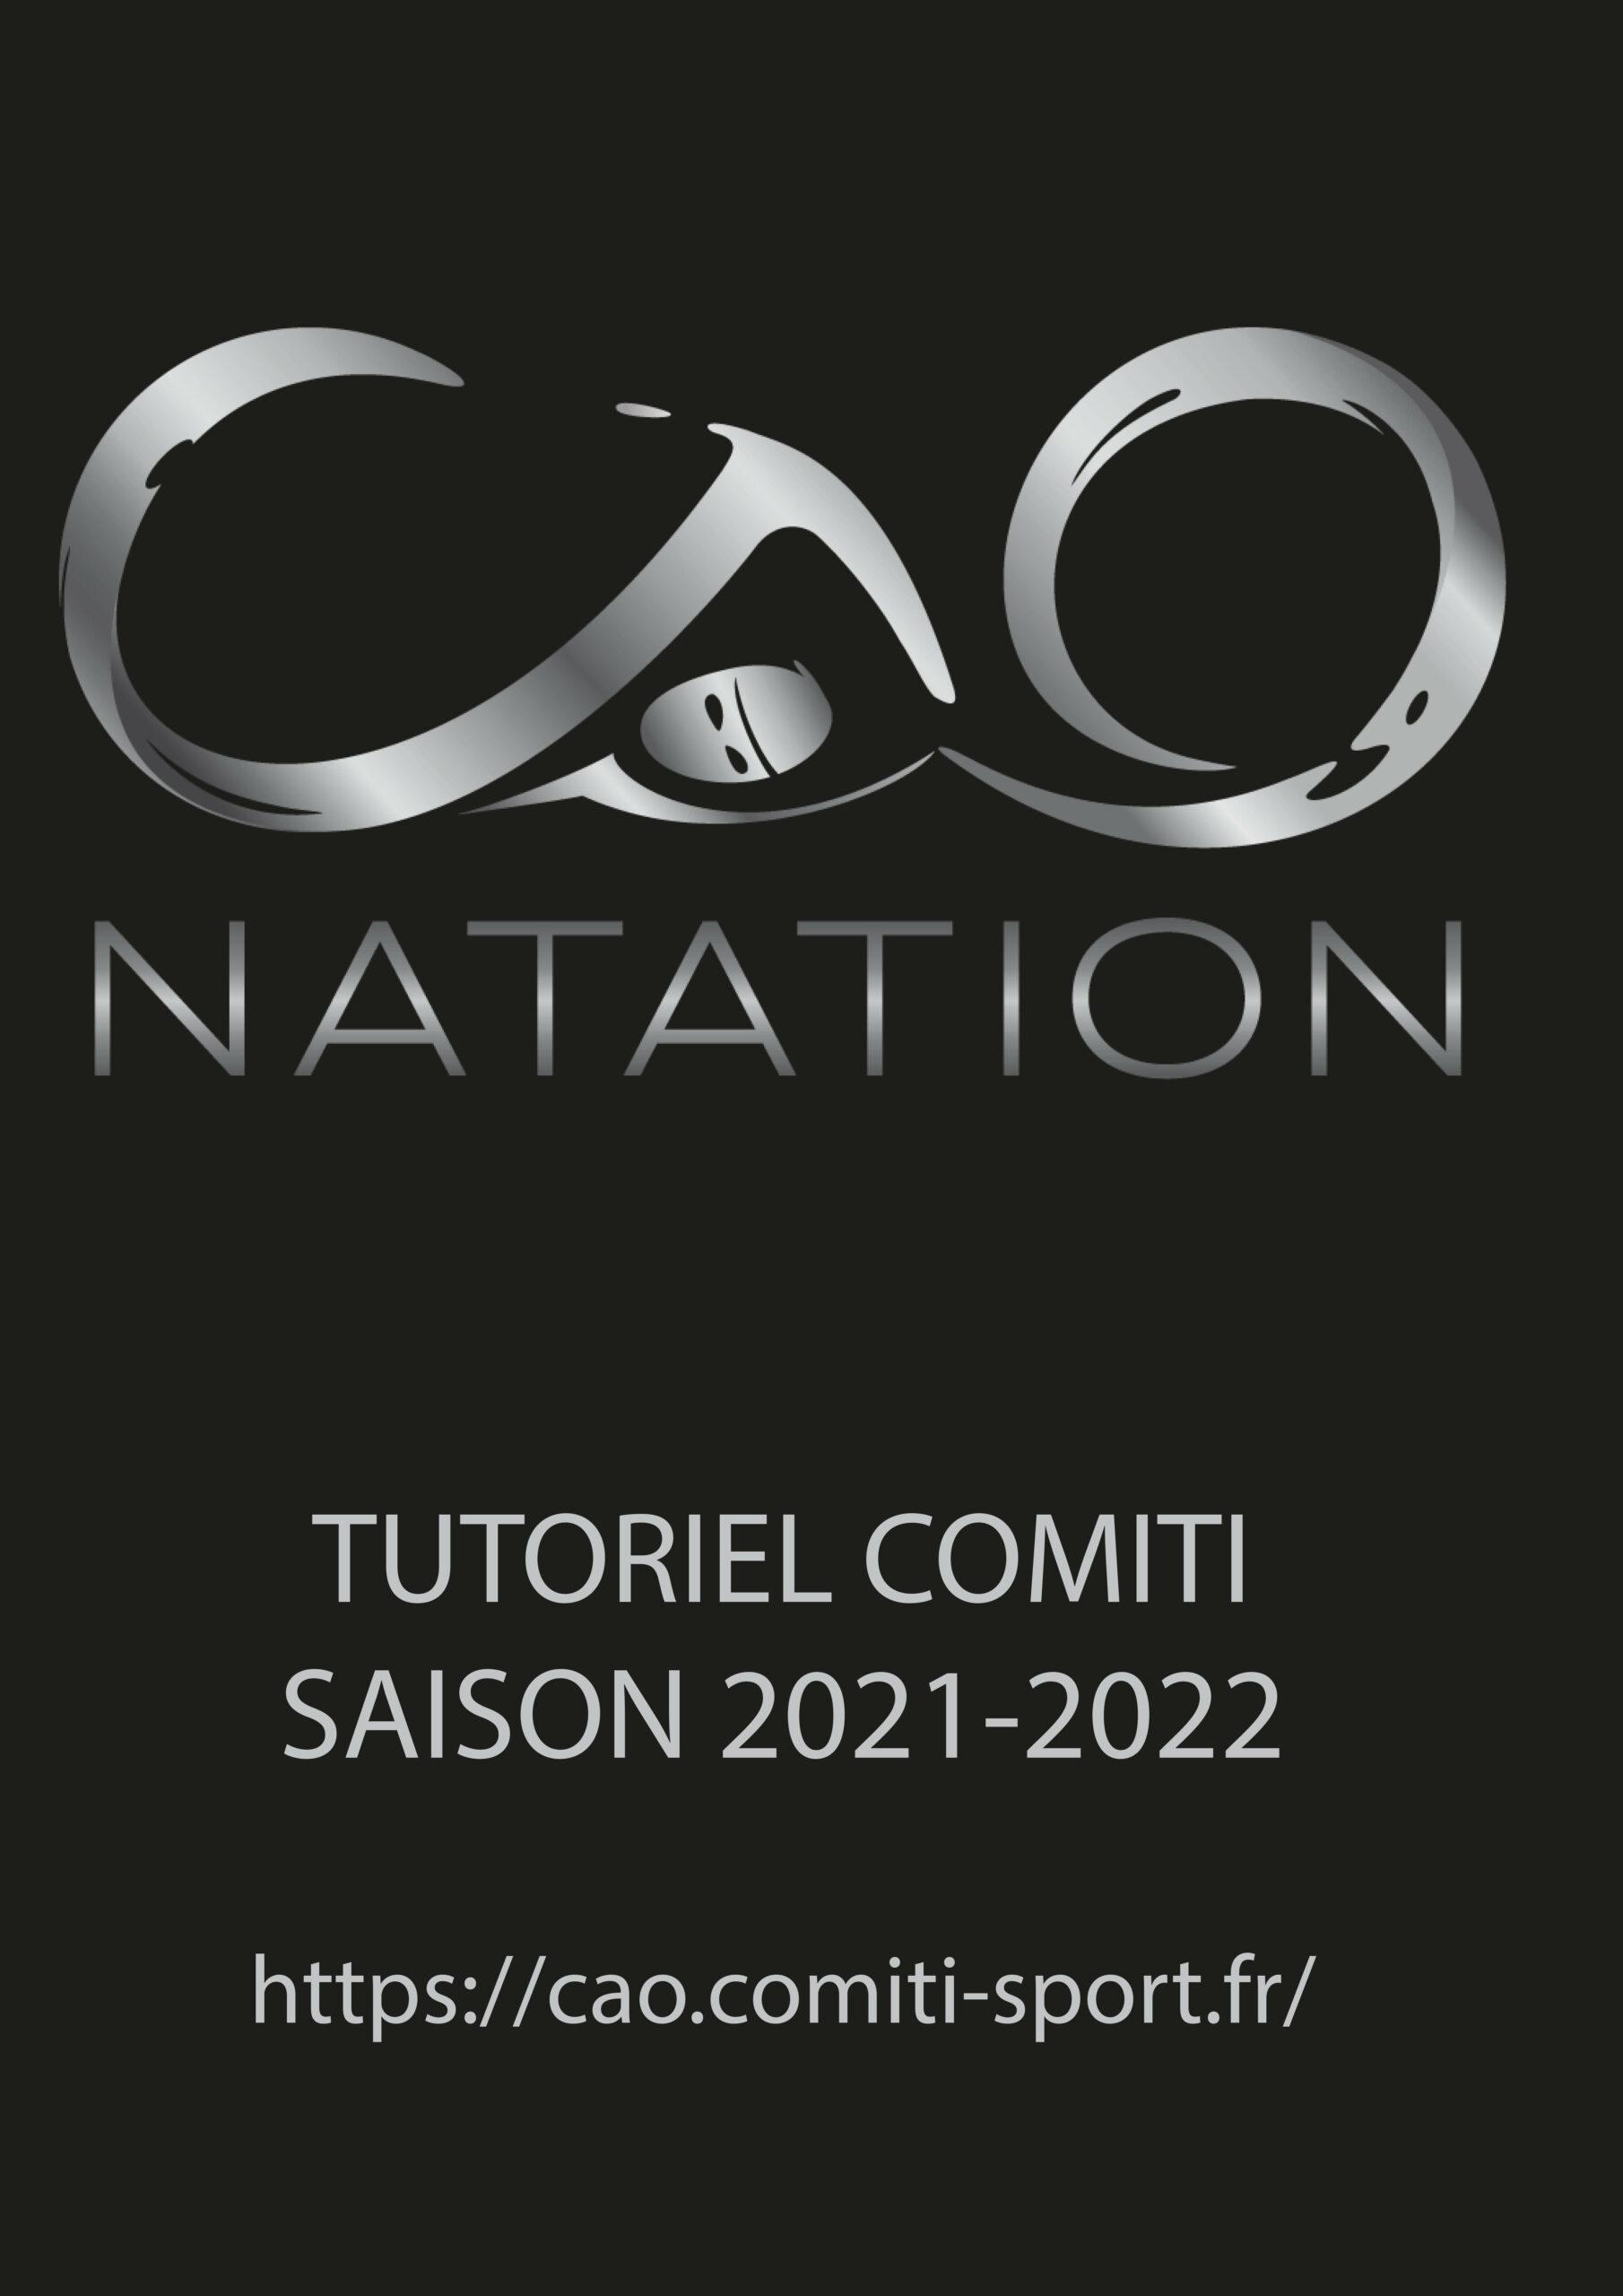 Tutoriel Comiti 2021-2022